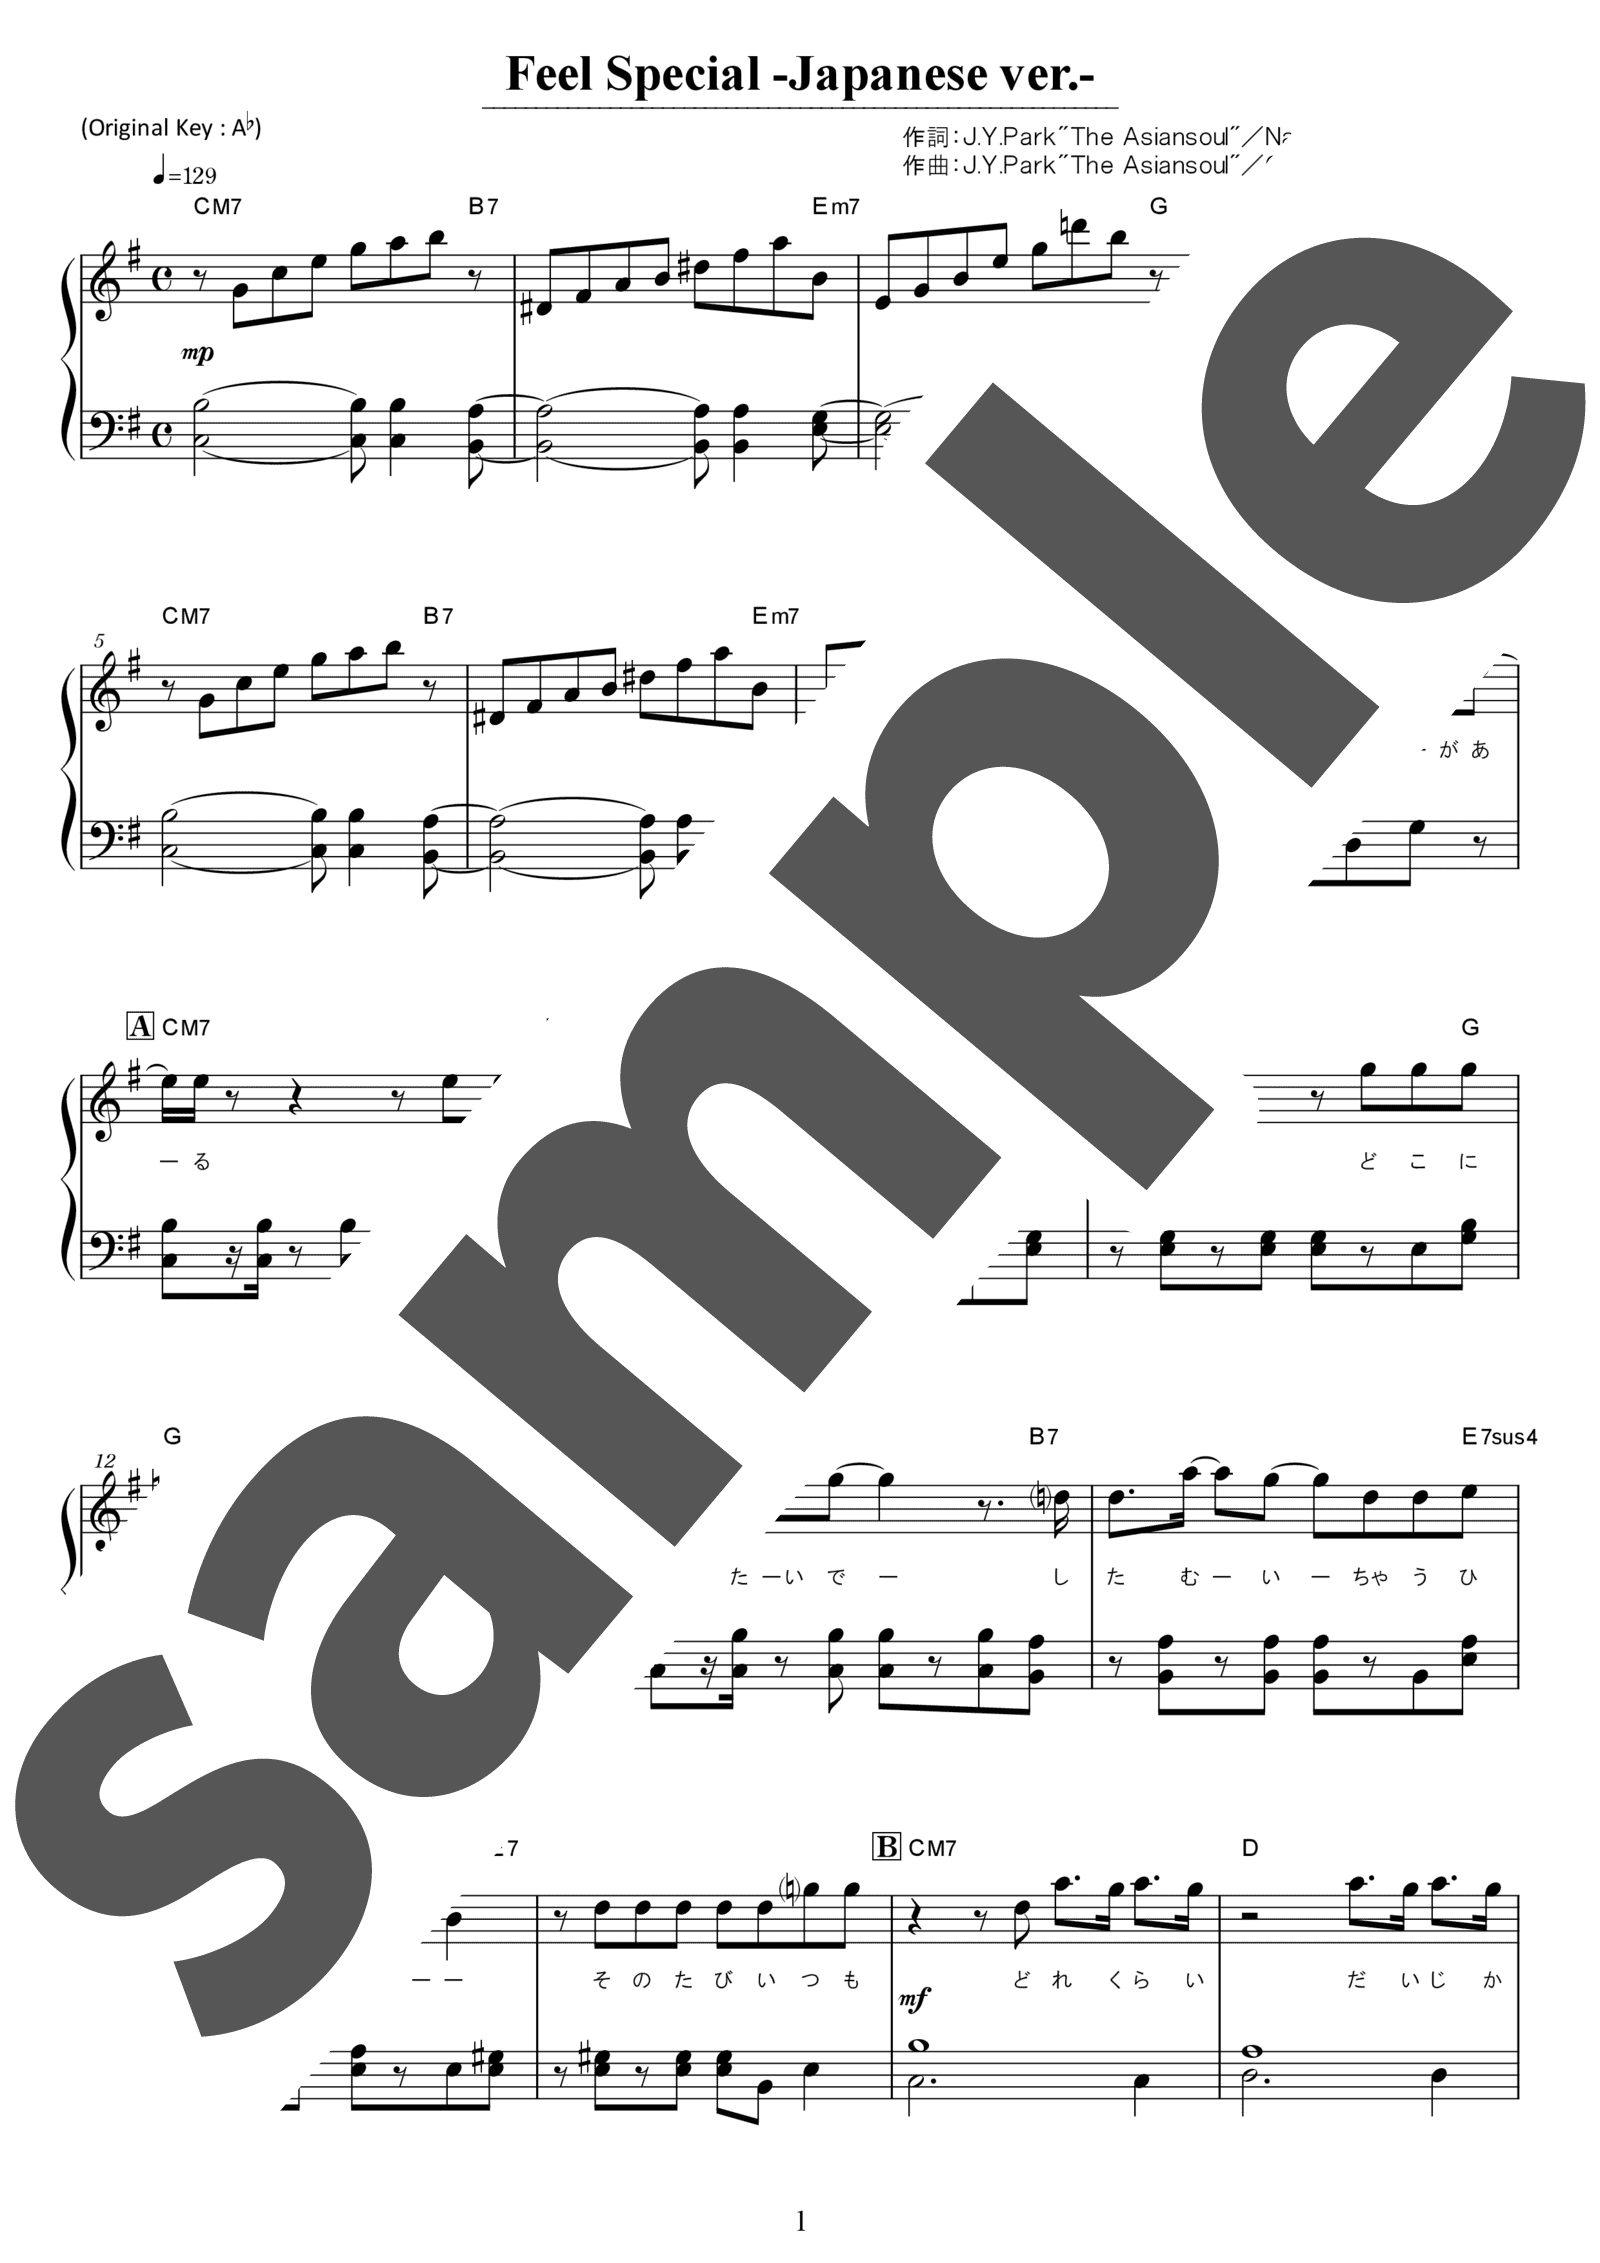 「Feel Special」のサンプル楽譜